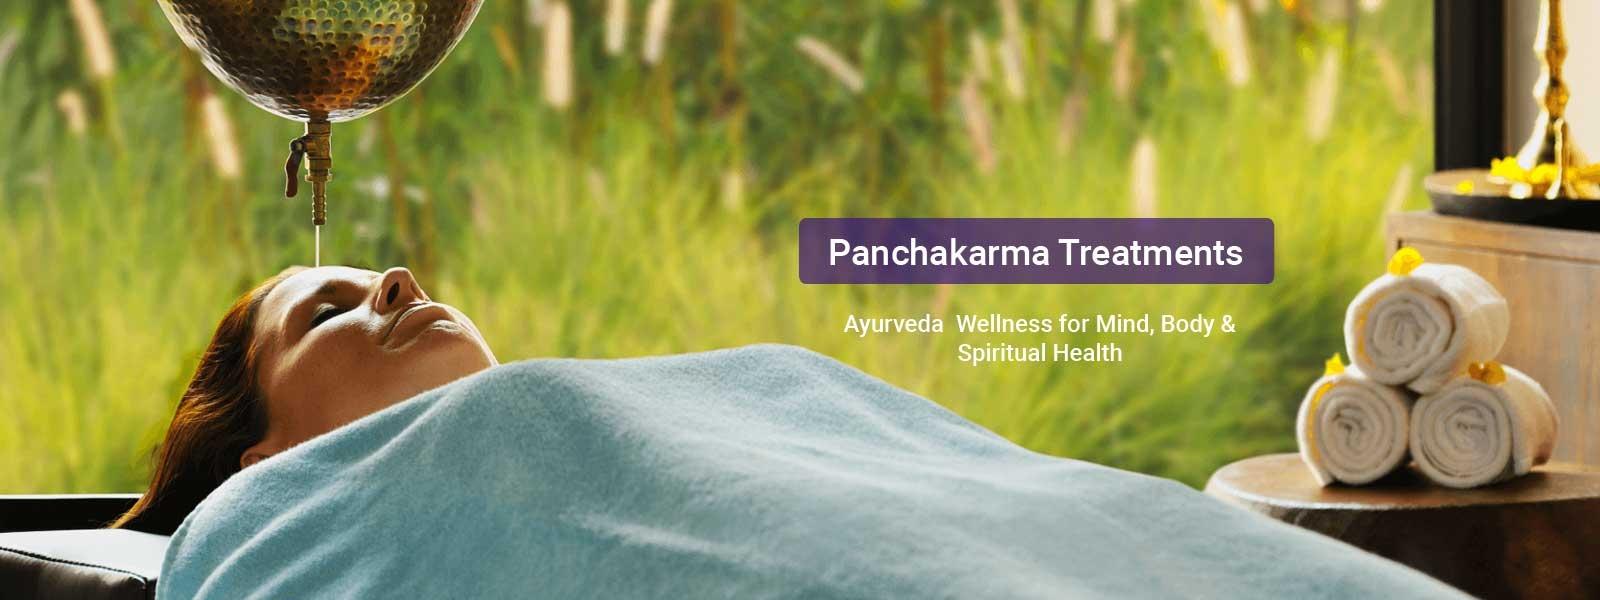 SKK Ayurveda and  Panchkarma (@skkayurvedaandpanchkarma) Cover Image